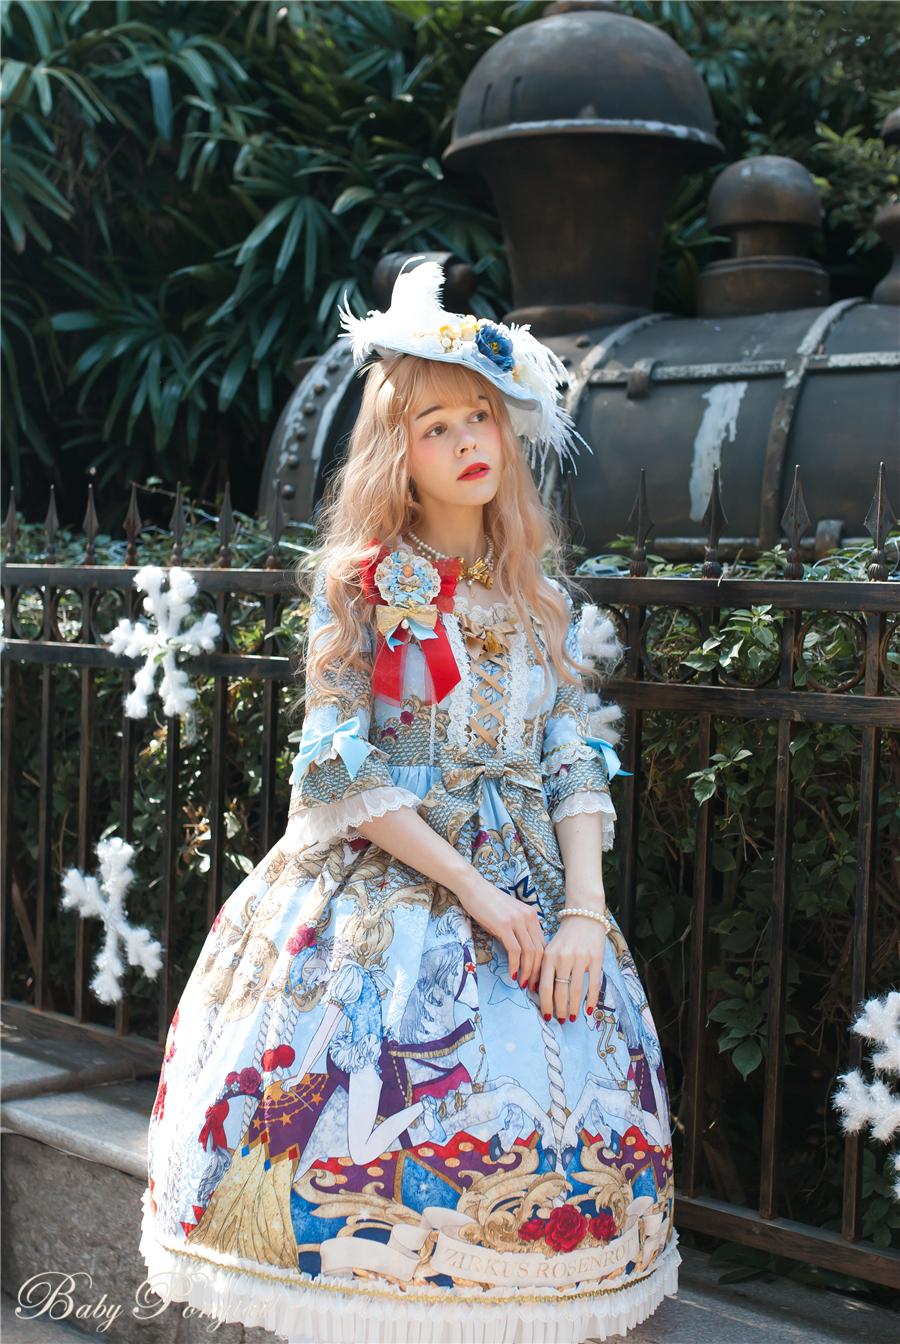 Baby Ponytail_Circus Princess_Sax OP_Claudia_11.jpg